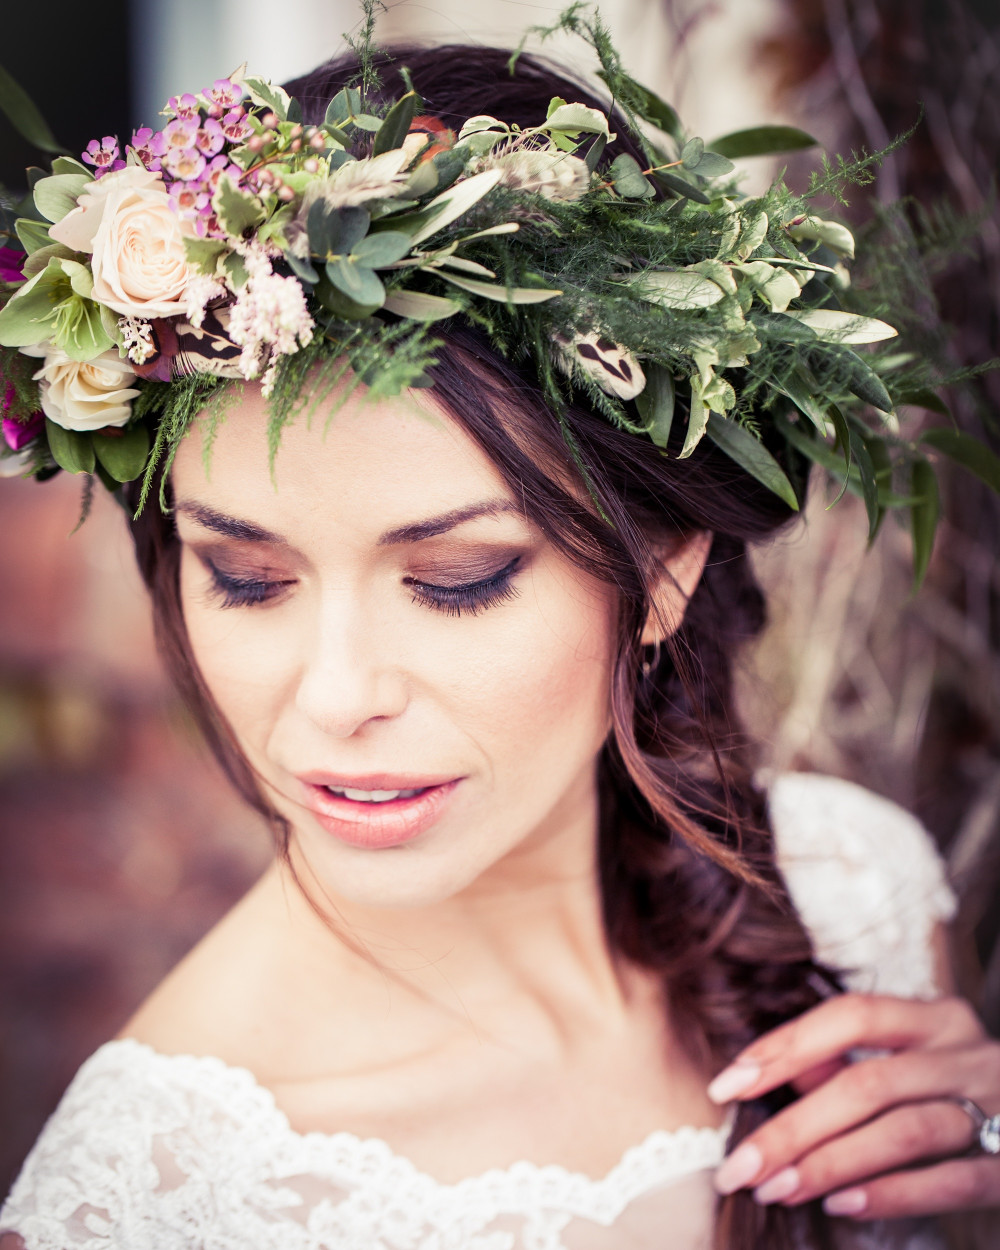 - Make Me Bridal Artist: Alison Martin Hair & Make-up. Photography by: Photography by Kathryn. #bohemian #vintage #boho #flowercrown #bridalmakeup #bridalhair #braid #lowbun